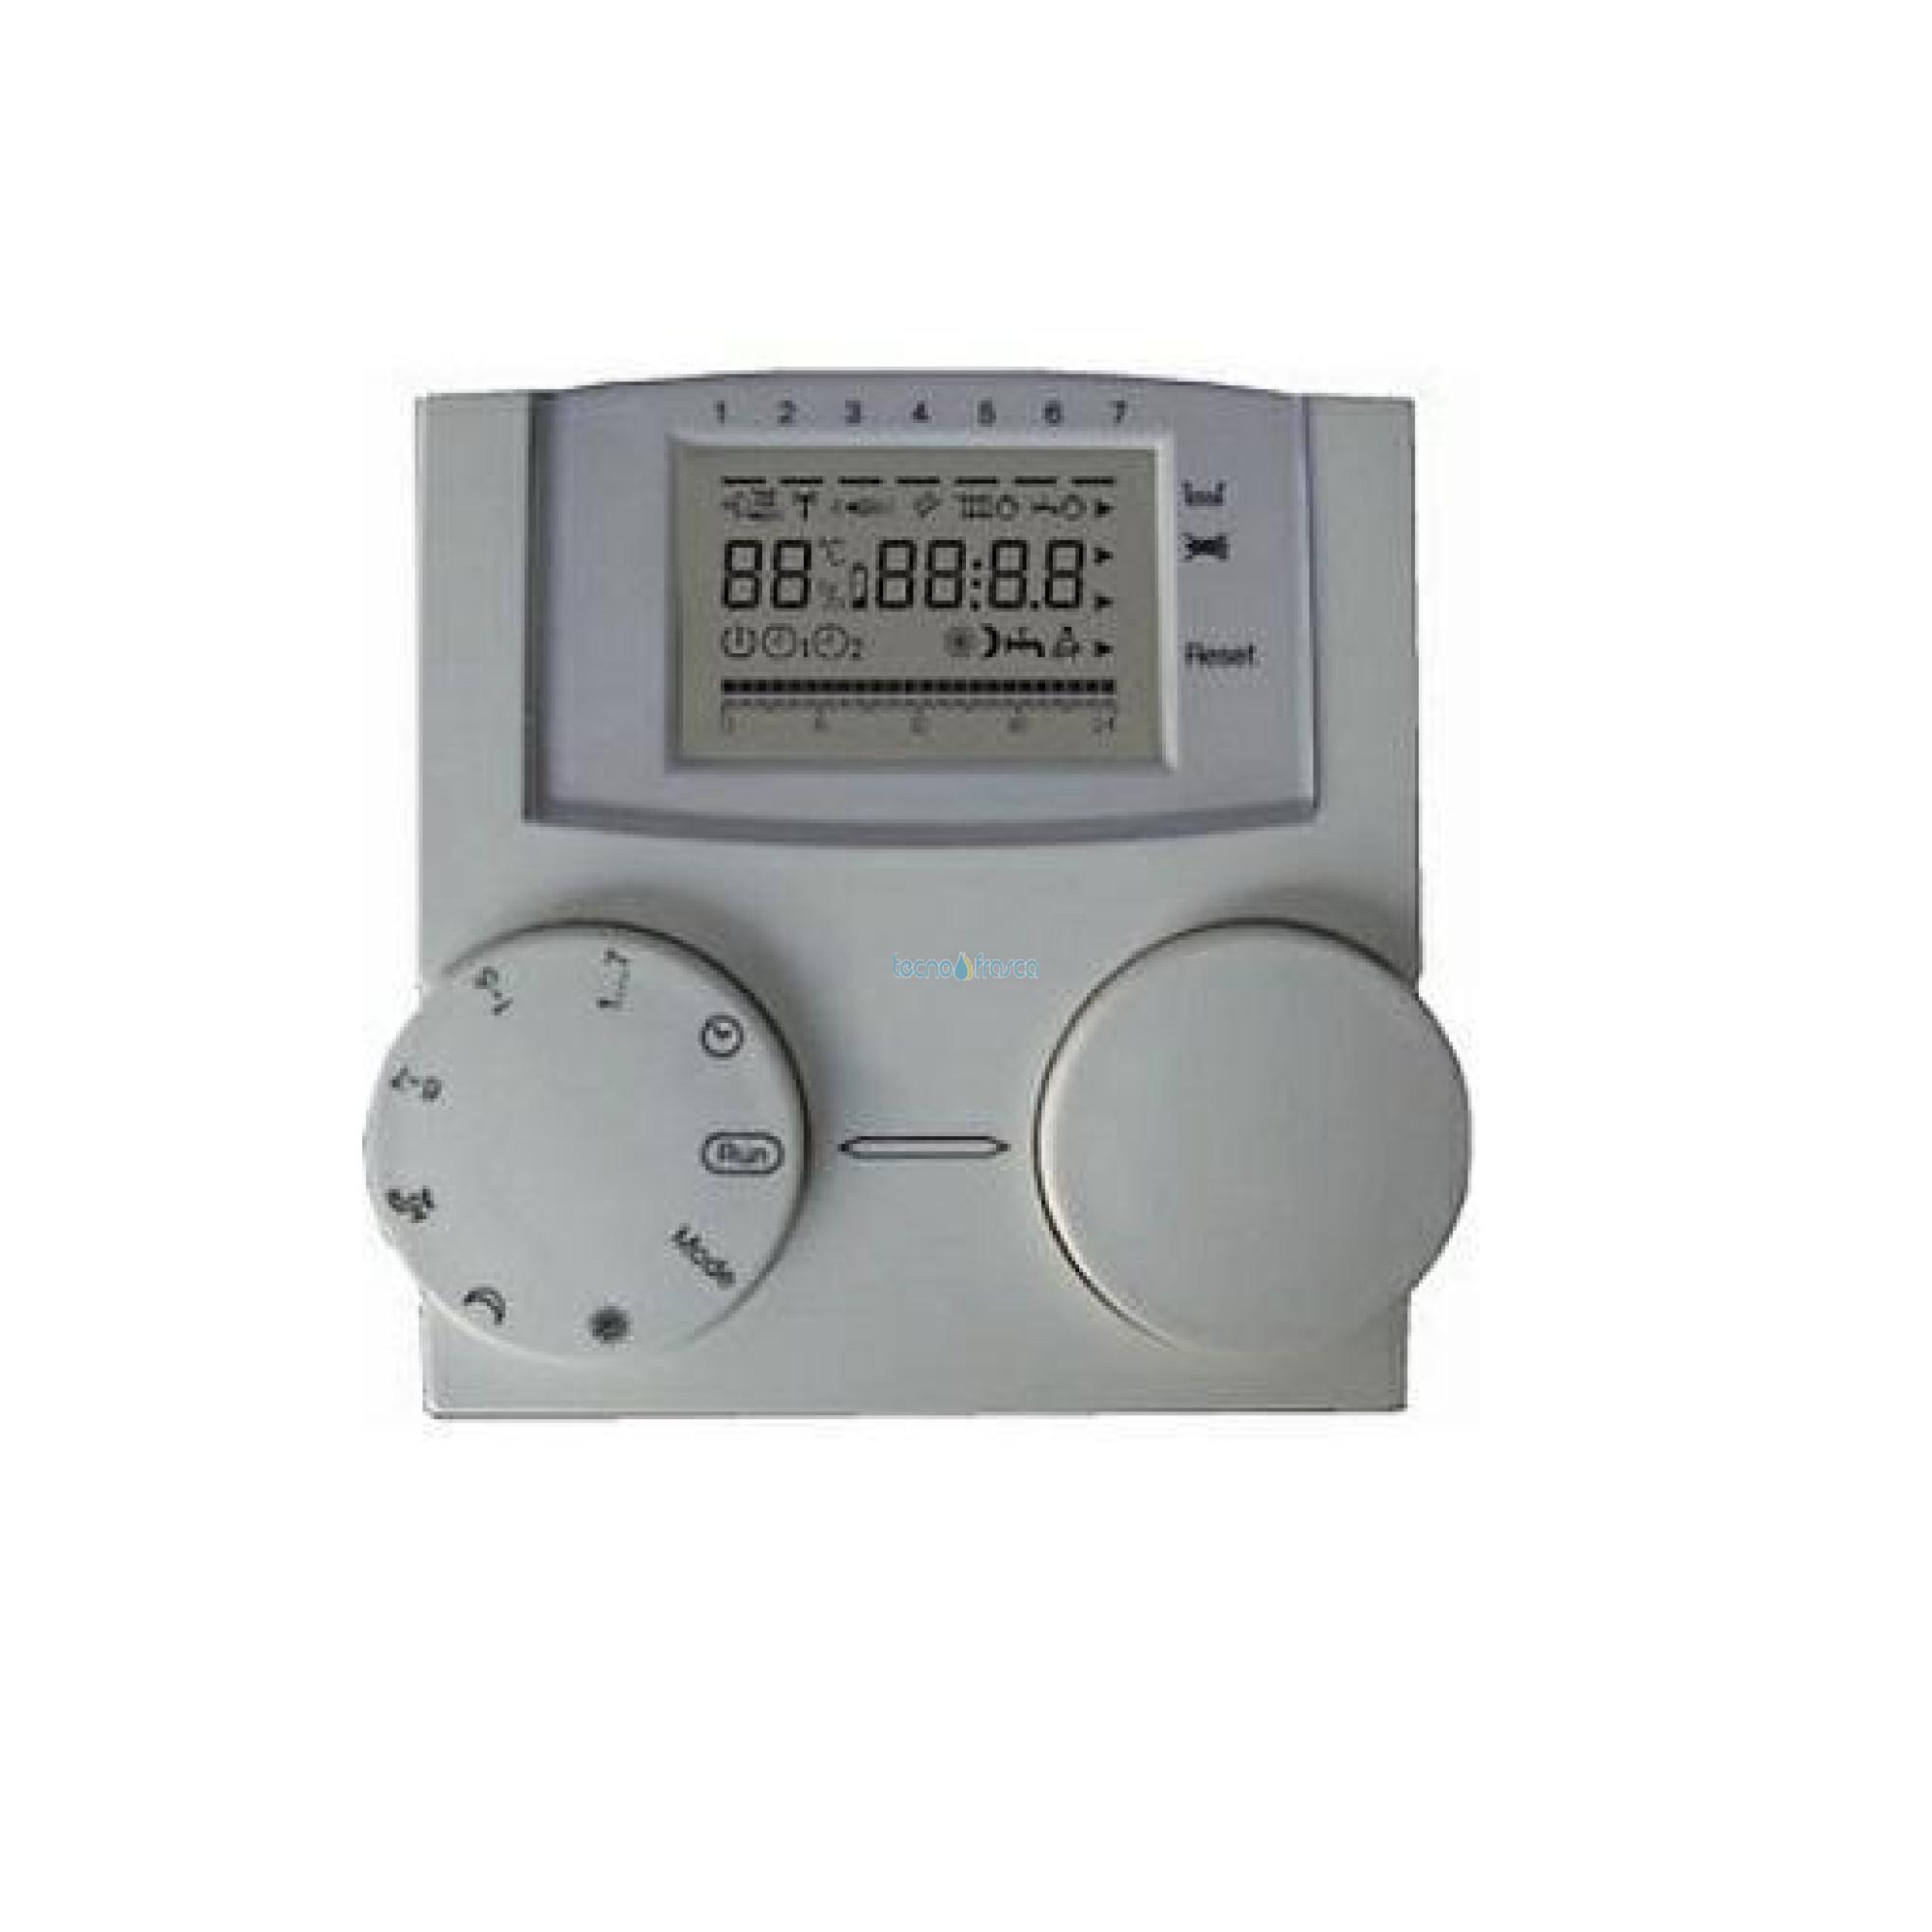 Beretta controllo remoto rec08b 20019915